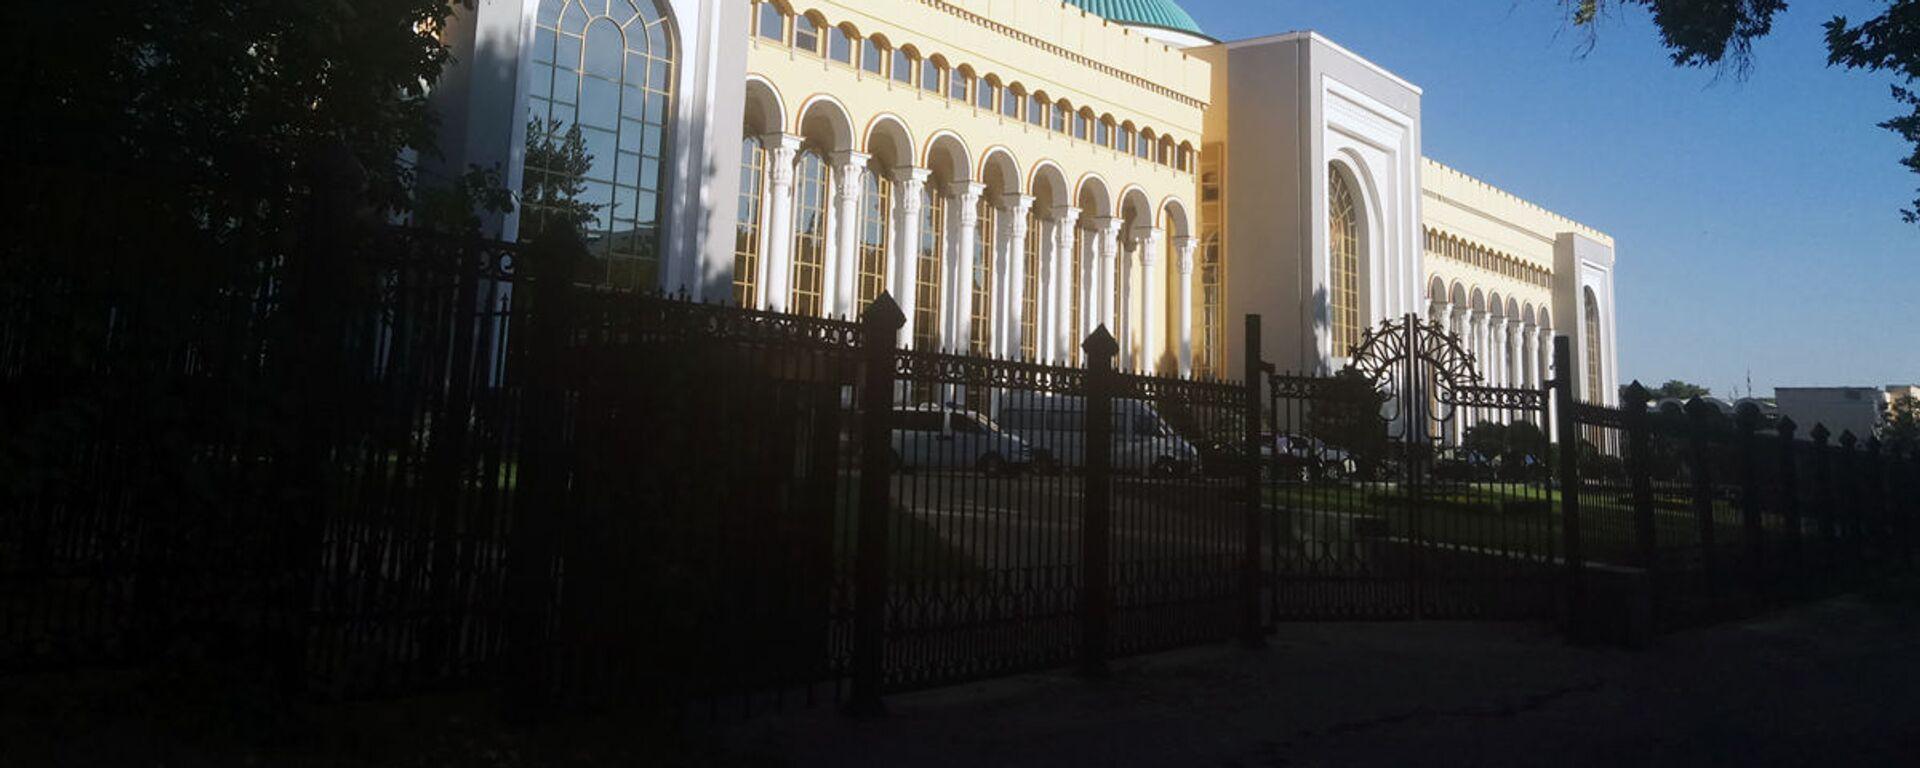 Zdaniye MID Uzbekistana - Sputnik Oʻzbekiston, 1920, 08.09.2021